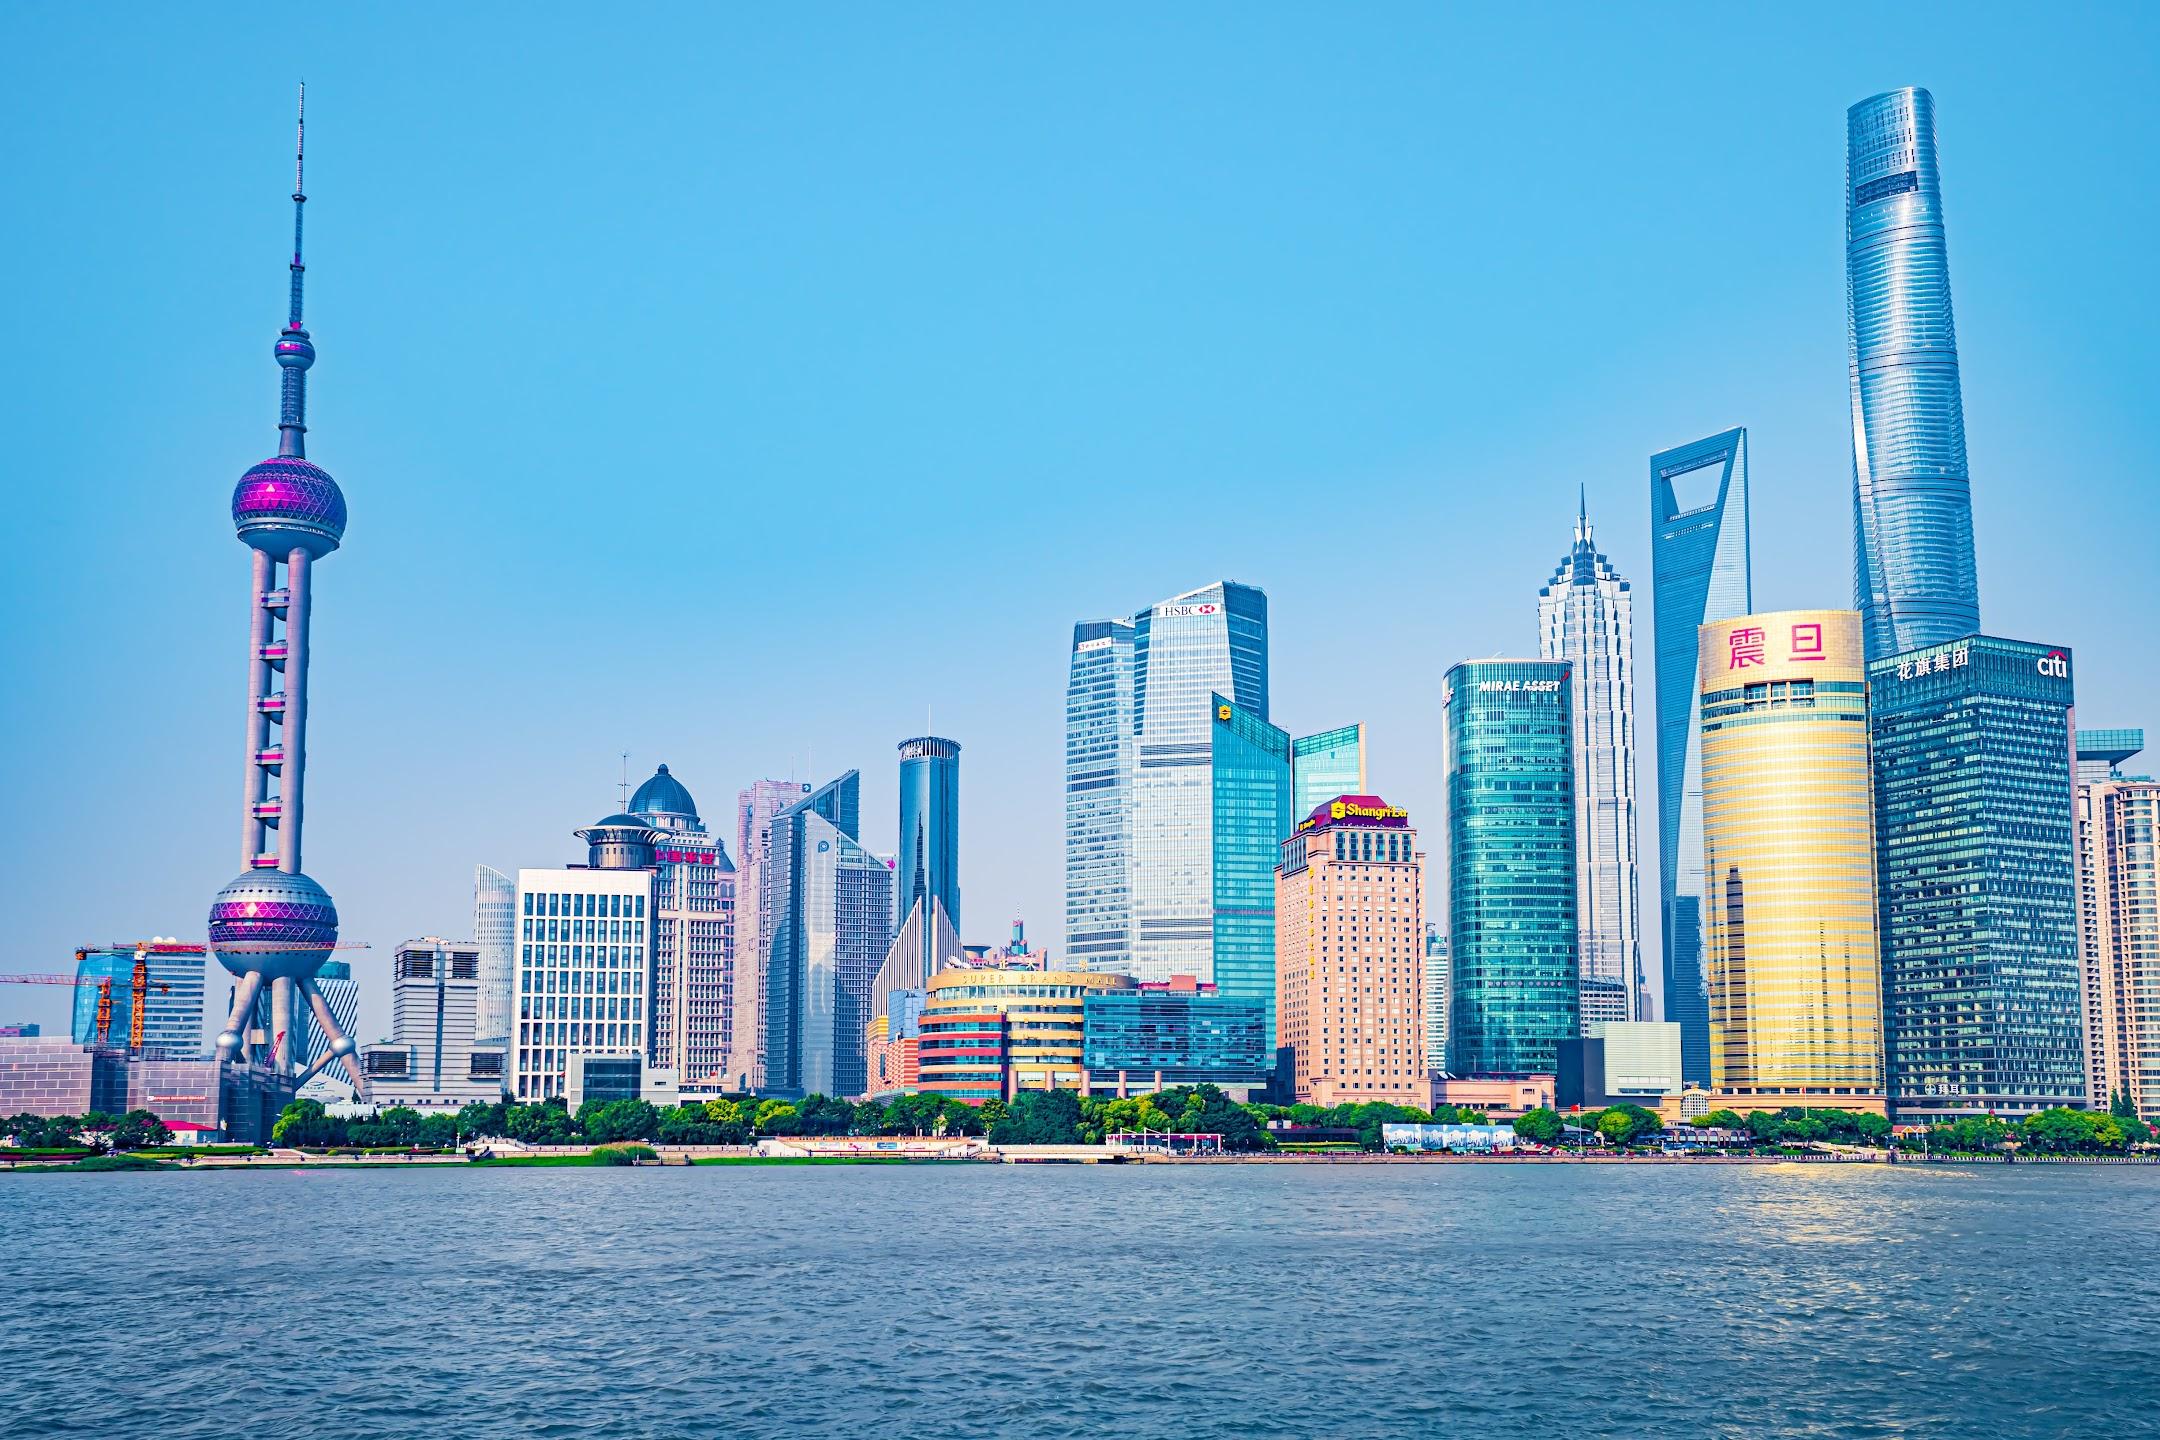 Shanghai Waitan (The Bund) Pudong3